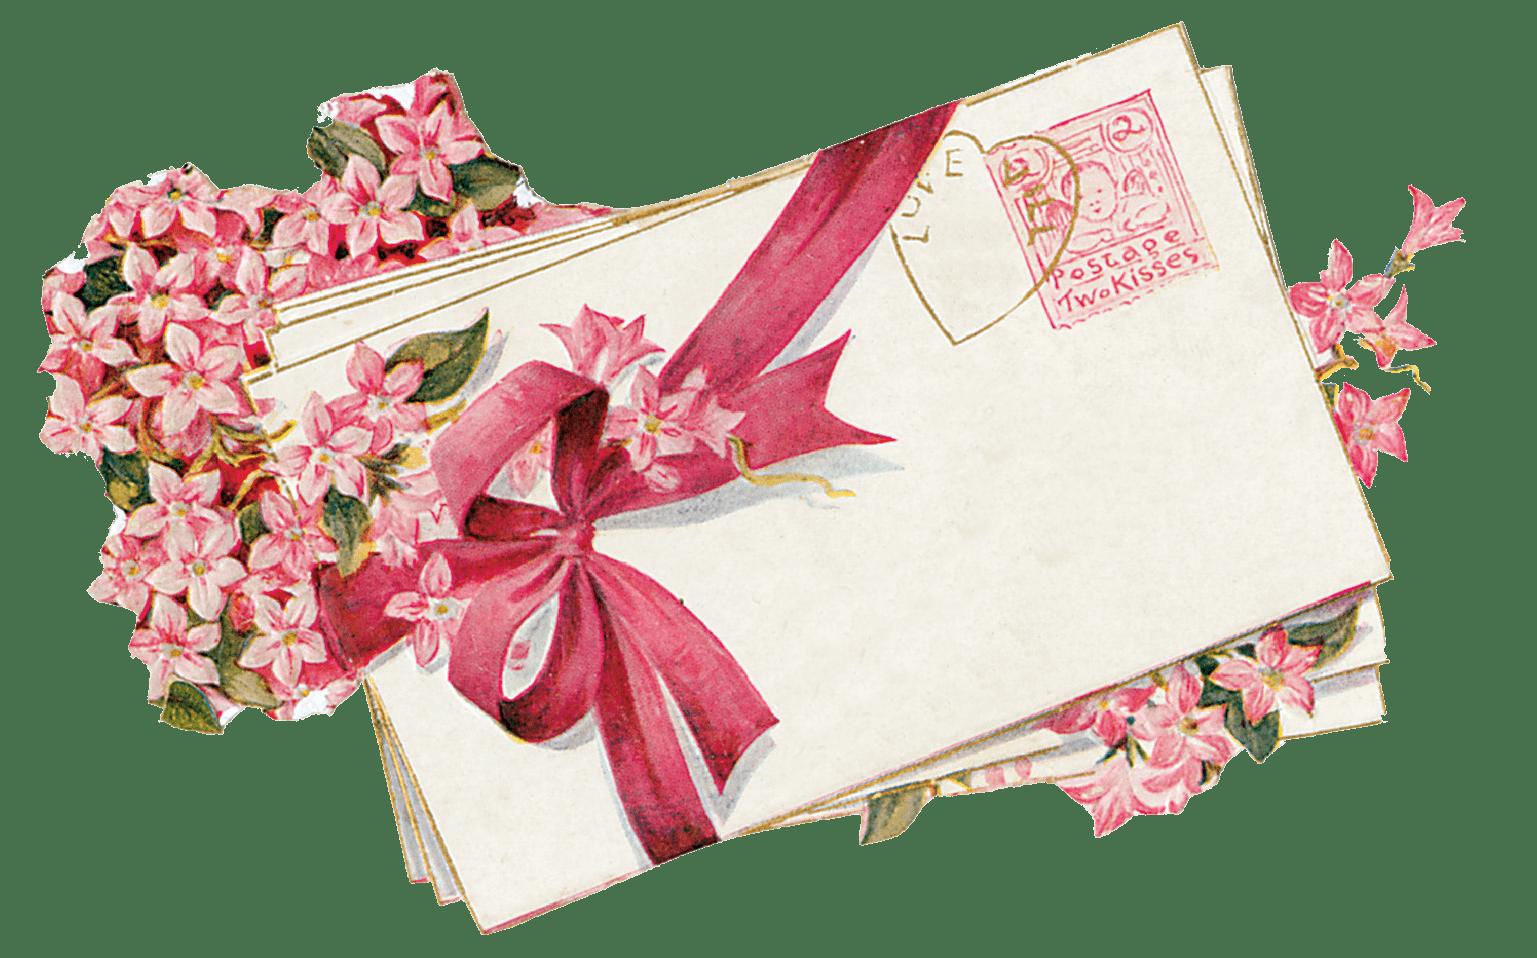 Letter clipart piece paper Transparent StickPNG Folded Paper Sheet